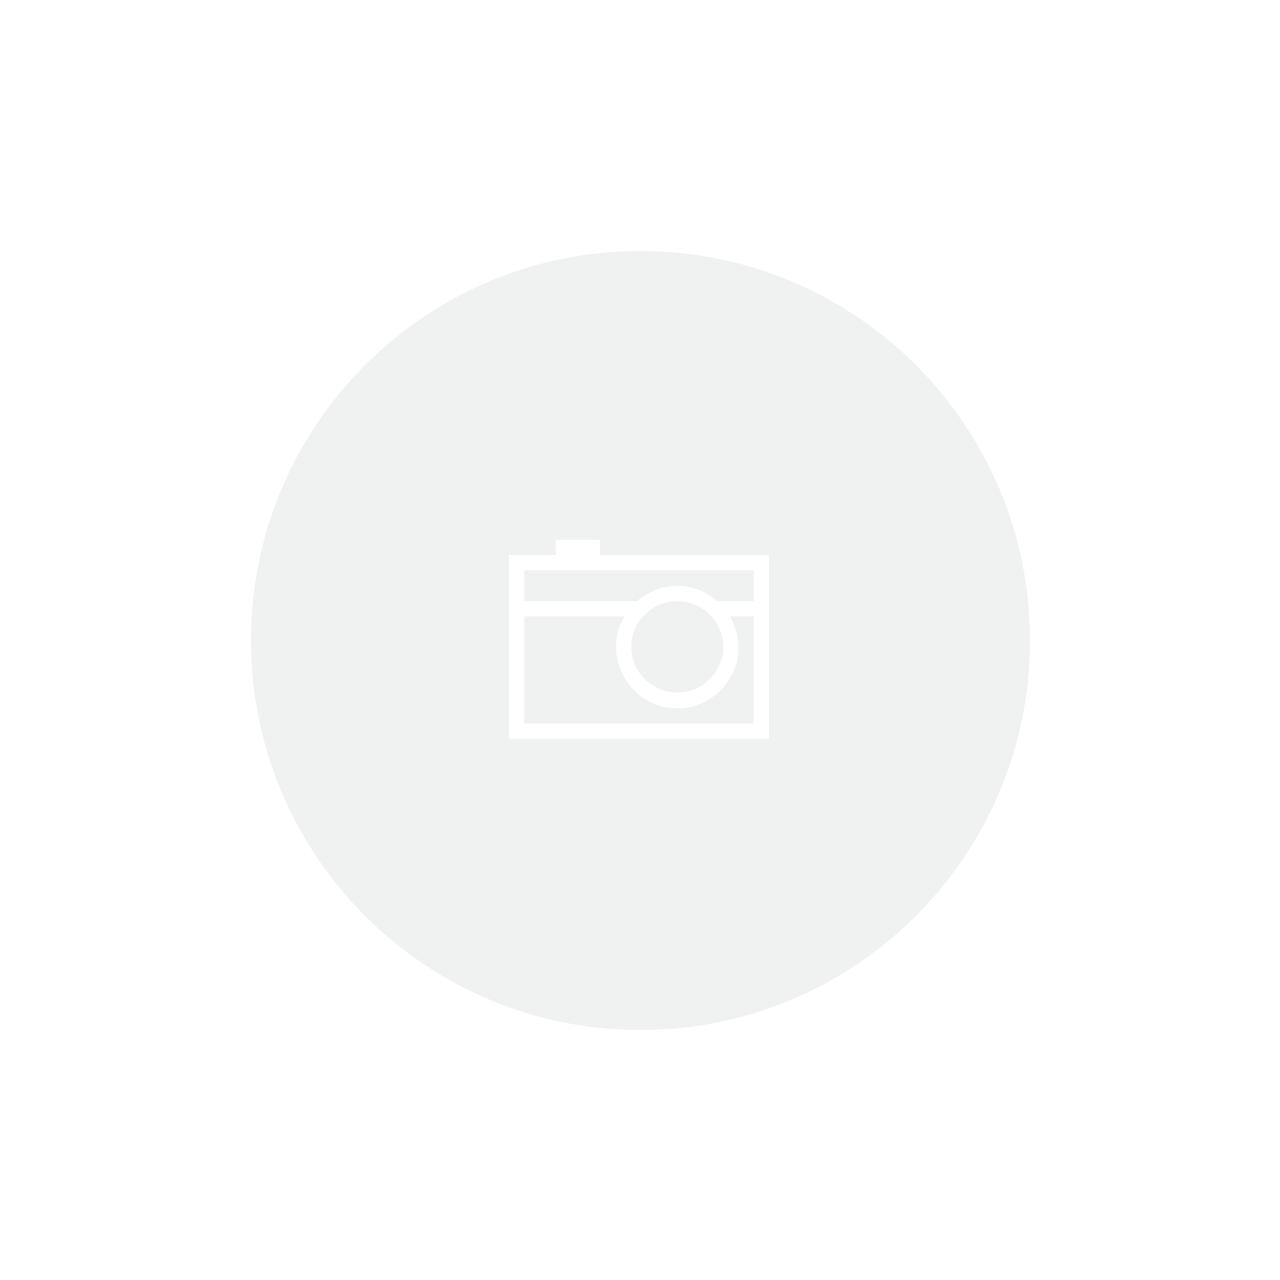 Papel Artesanal Indiano - Ref. 25